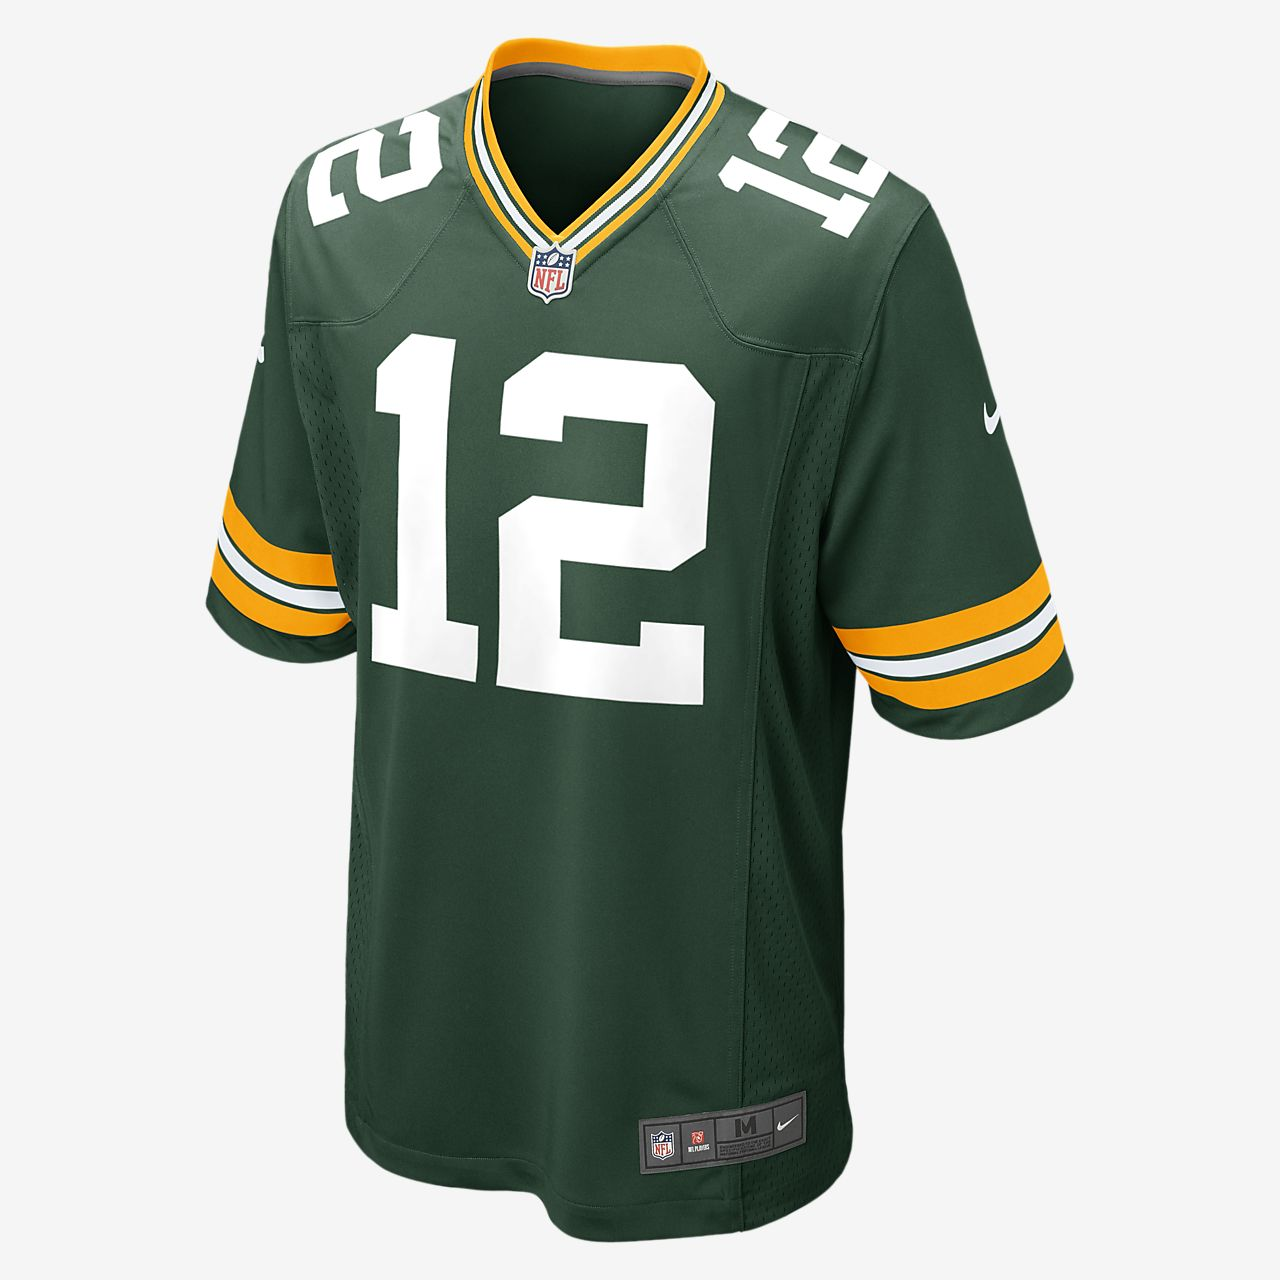 Maglia da football americano NFL Green Bay Packers (Aaron Rodgers) Home Game - Uomo